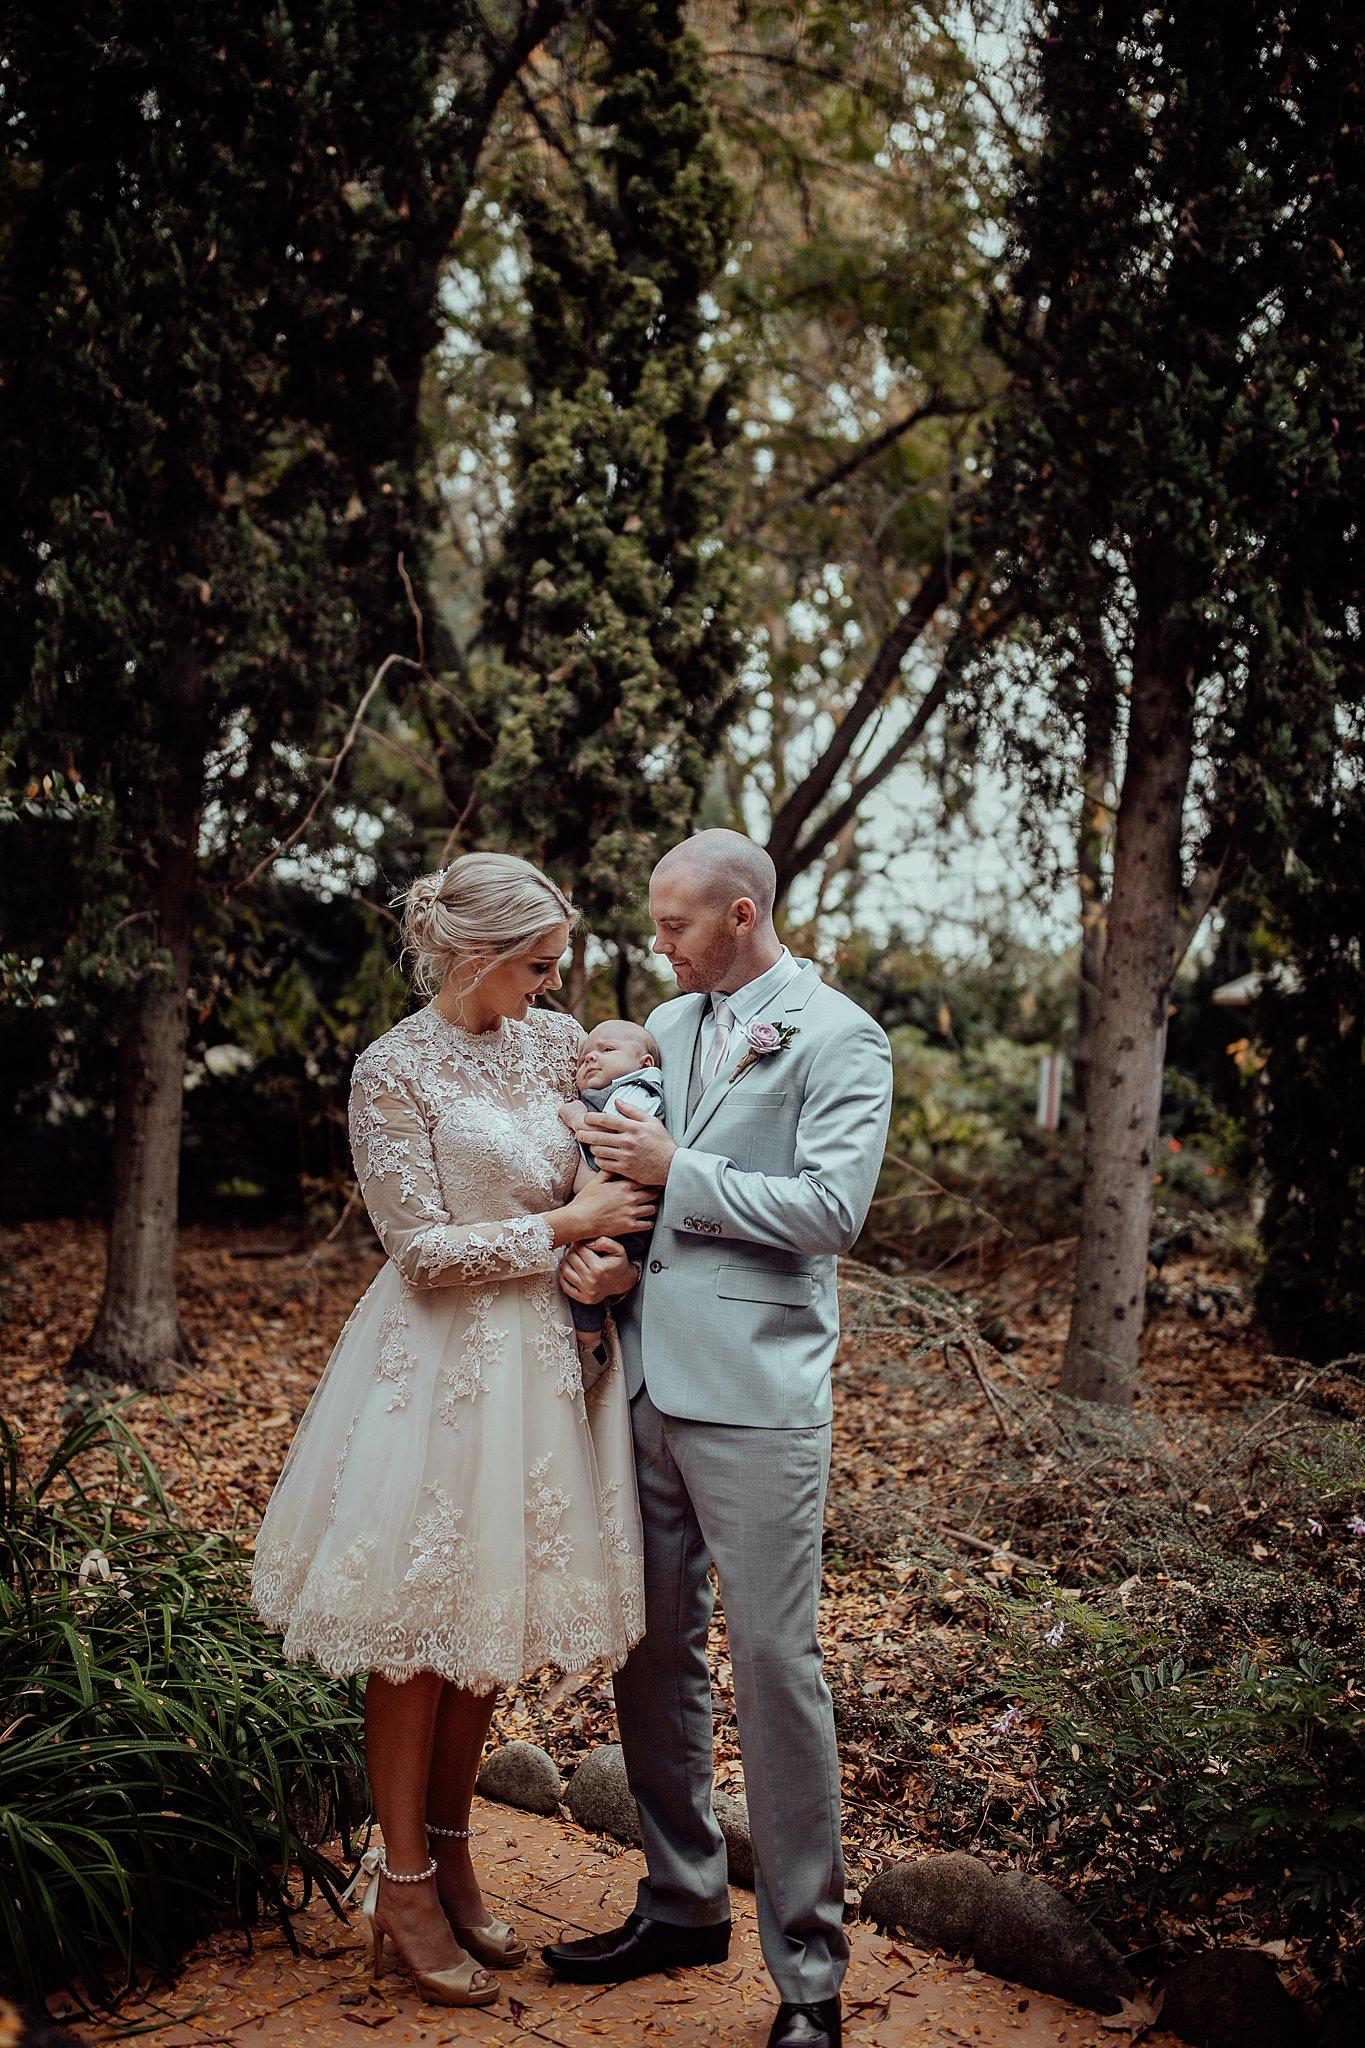 mickalathomas_puremacphotography_weddingphotographer_couplephotographer_Sheppartonphotographer_3412.jpg